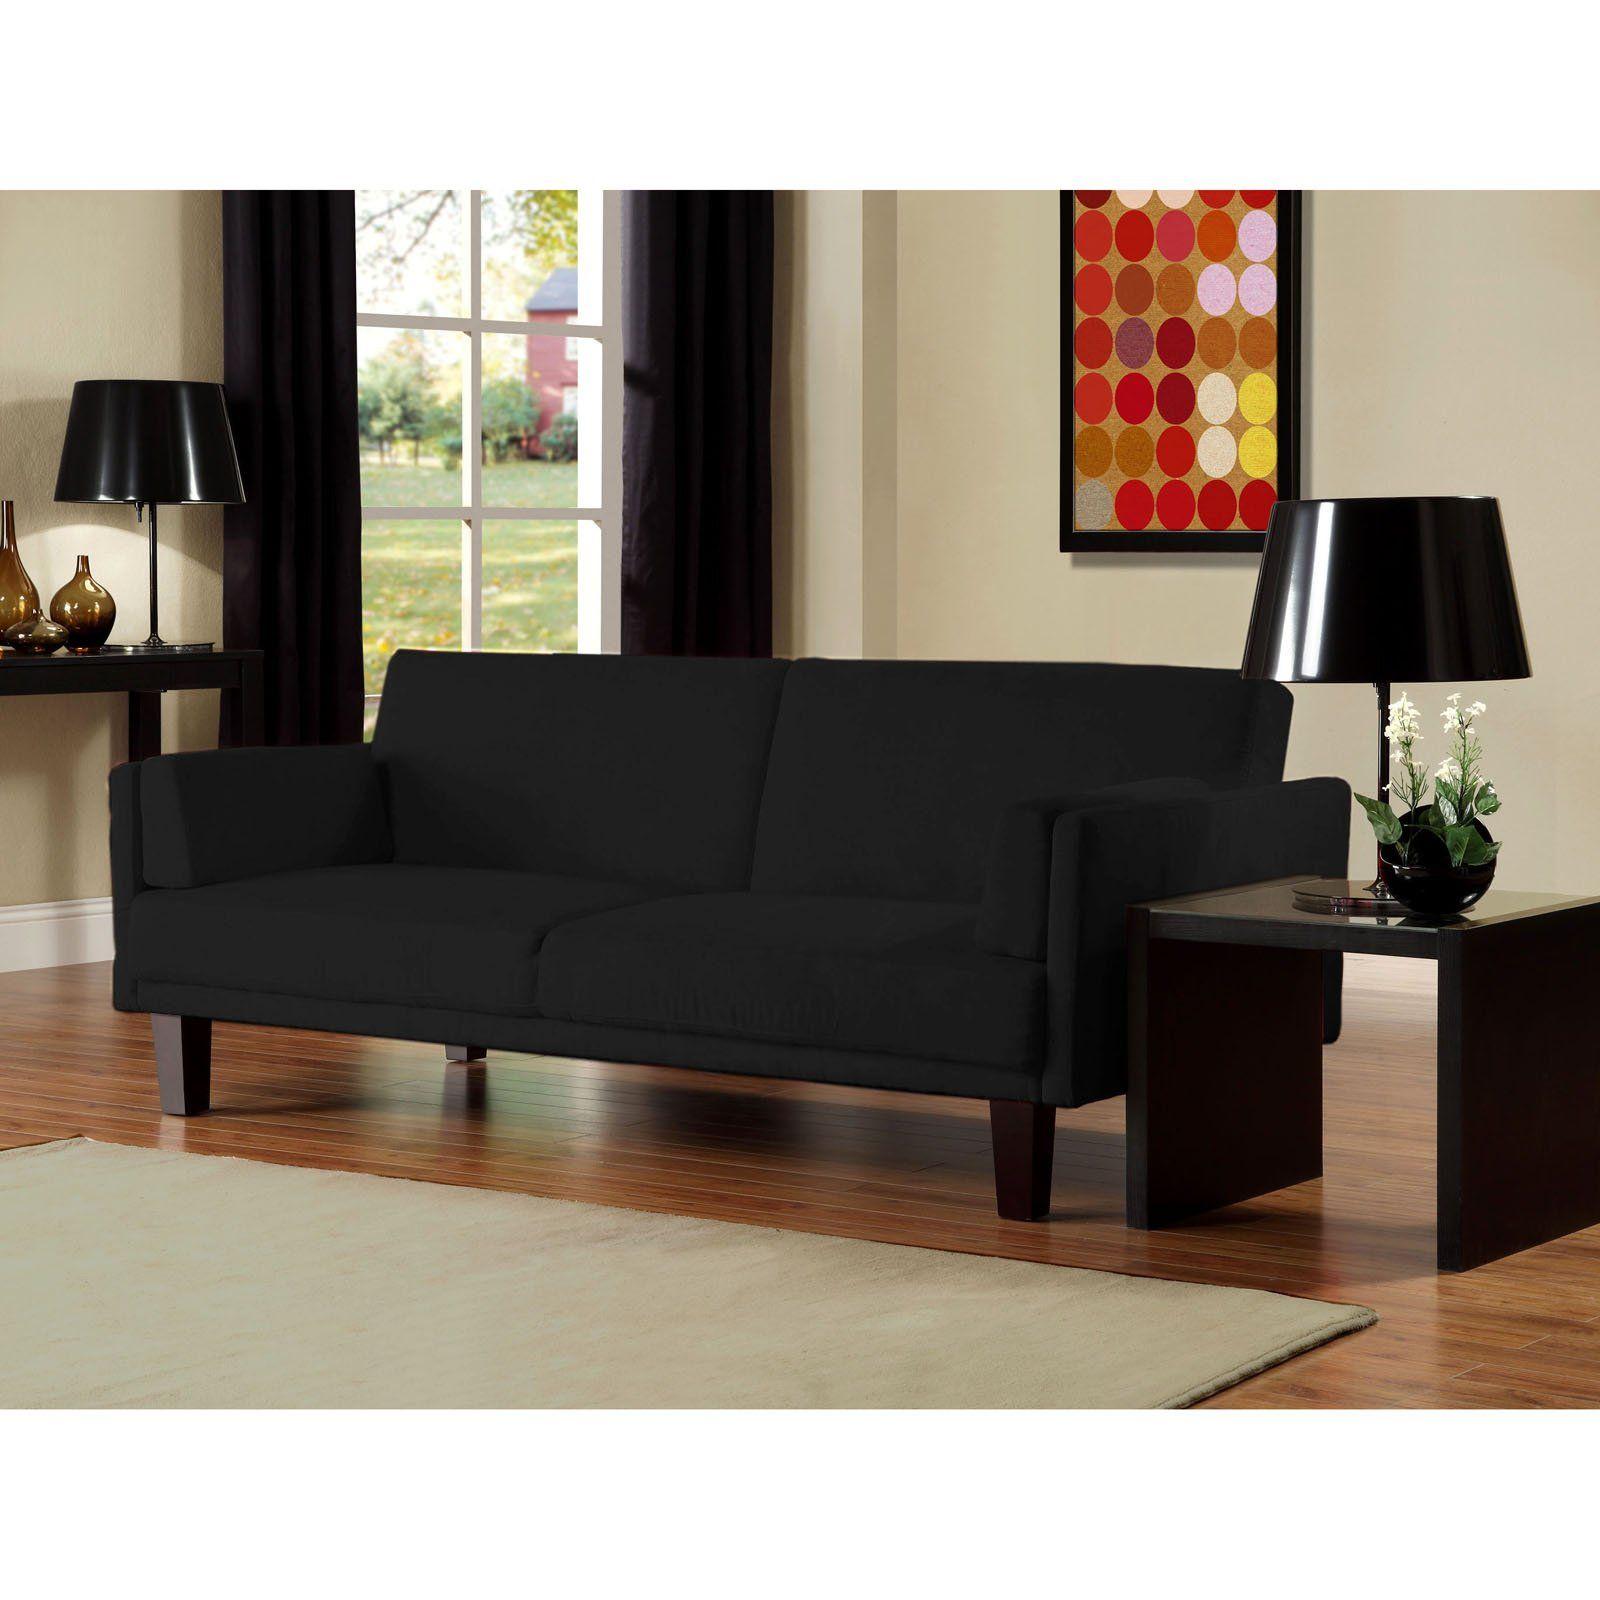 ameriwood metro futon   black    287 99  hayneedle   have to have it  ameriwood metro futon   black    287 99      rh   pinterest